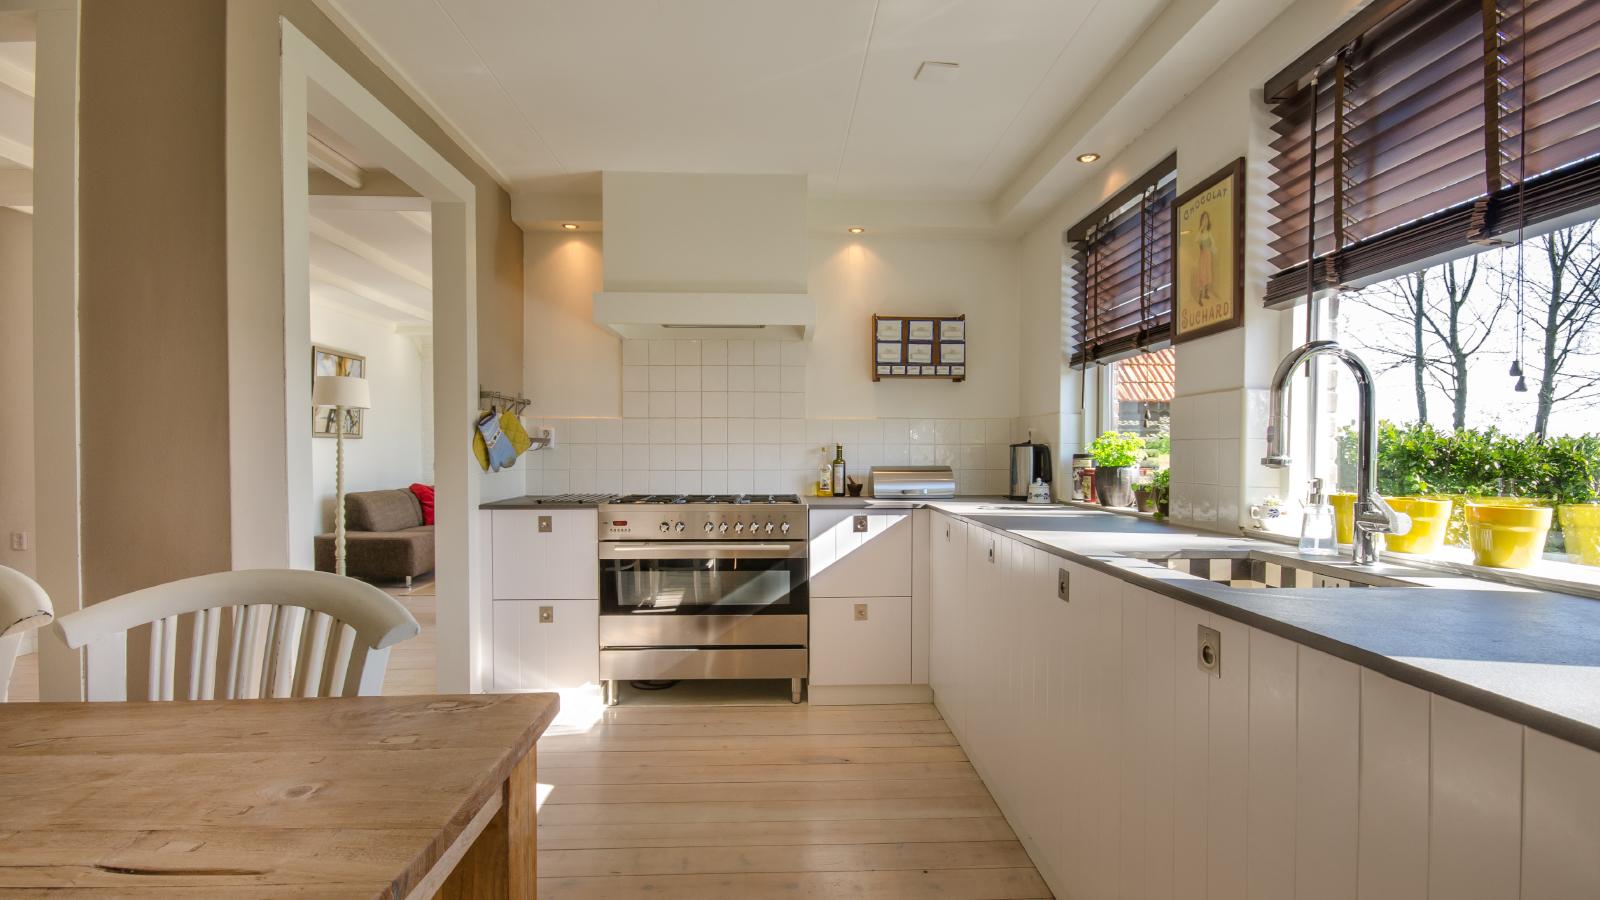 home interior photo of kitchen